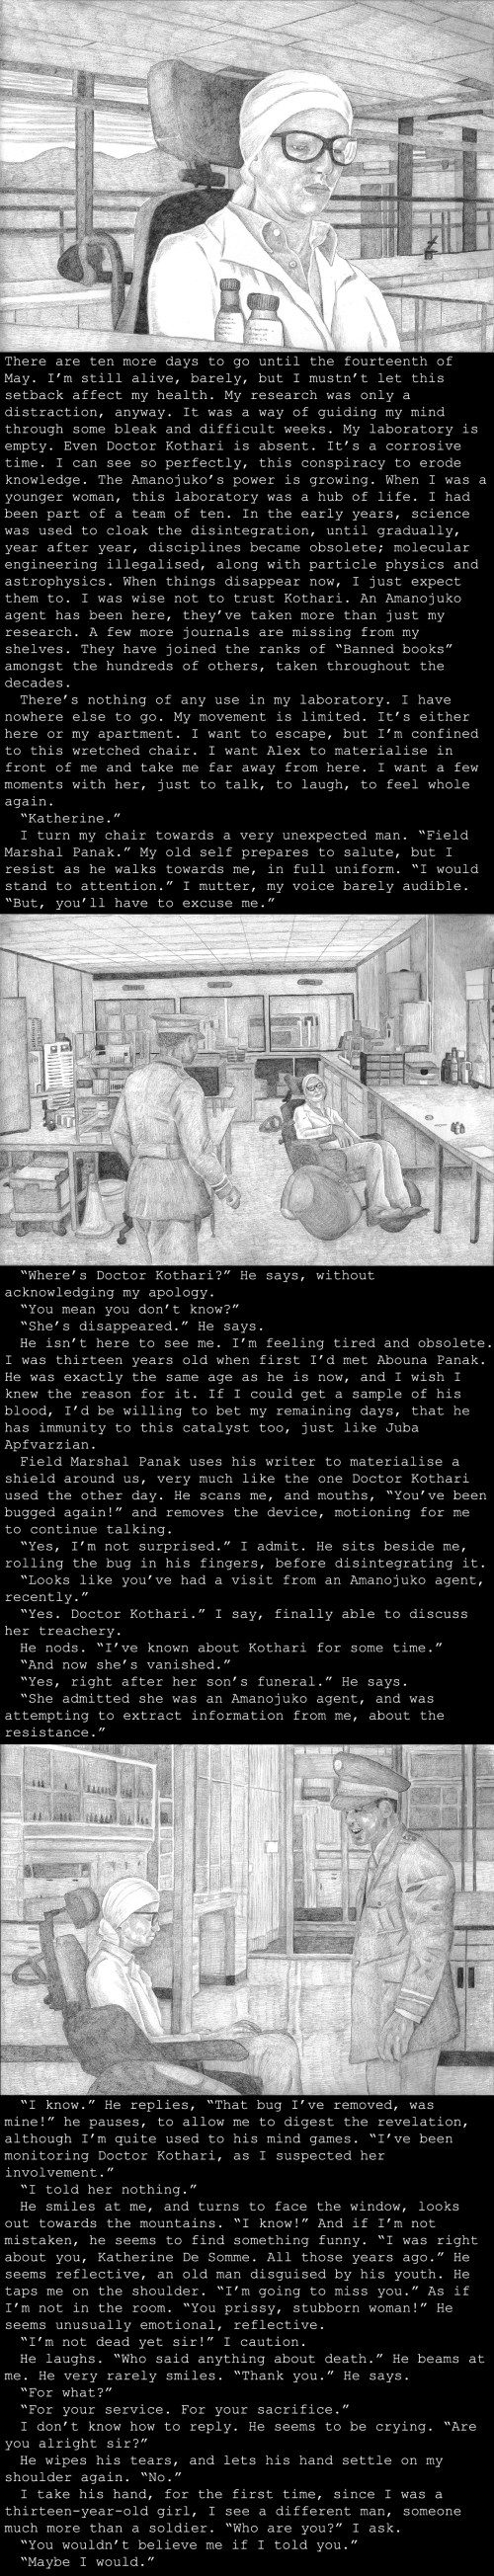 Katherine's back story, set in India (3991)